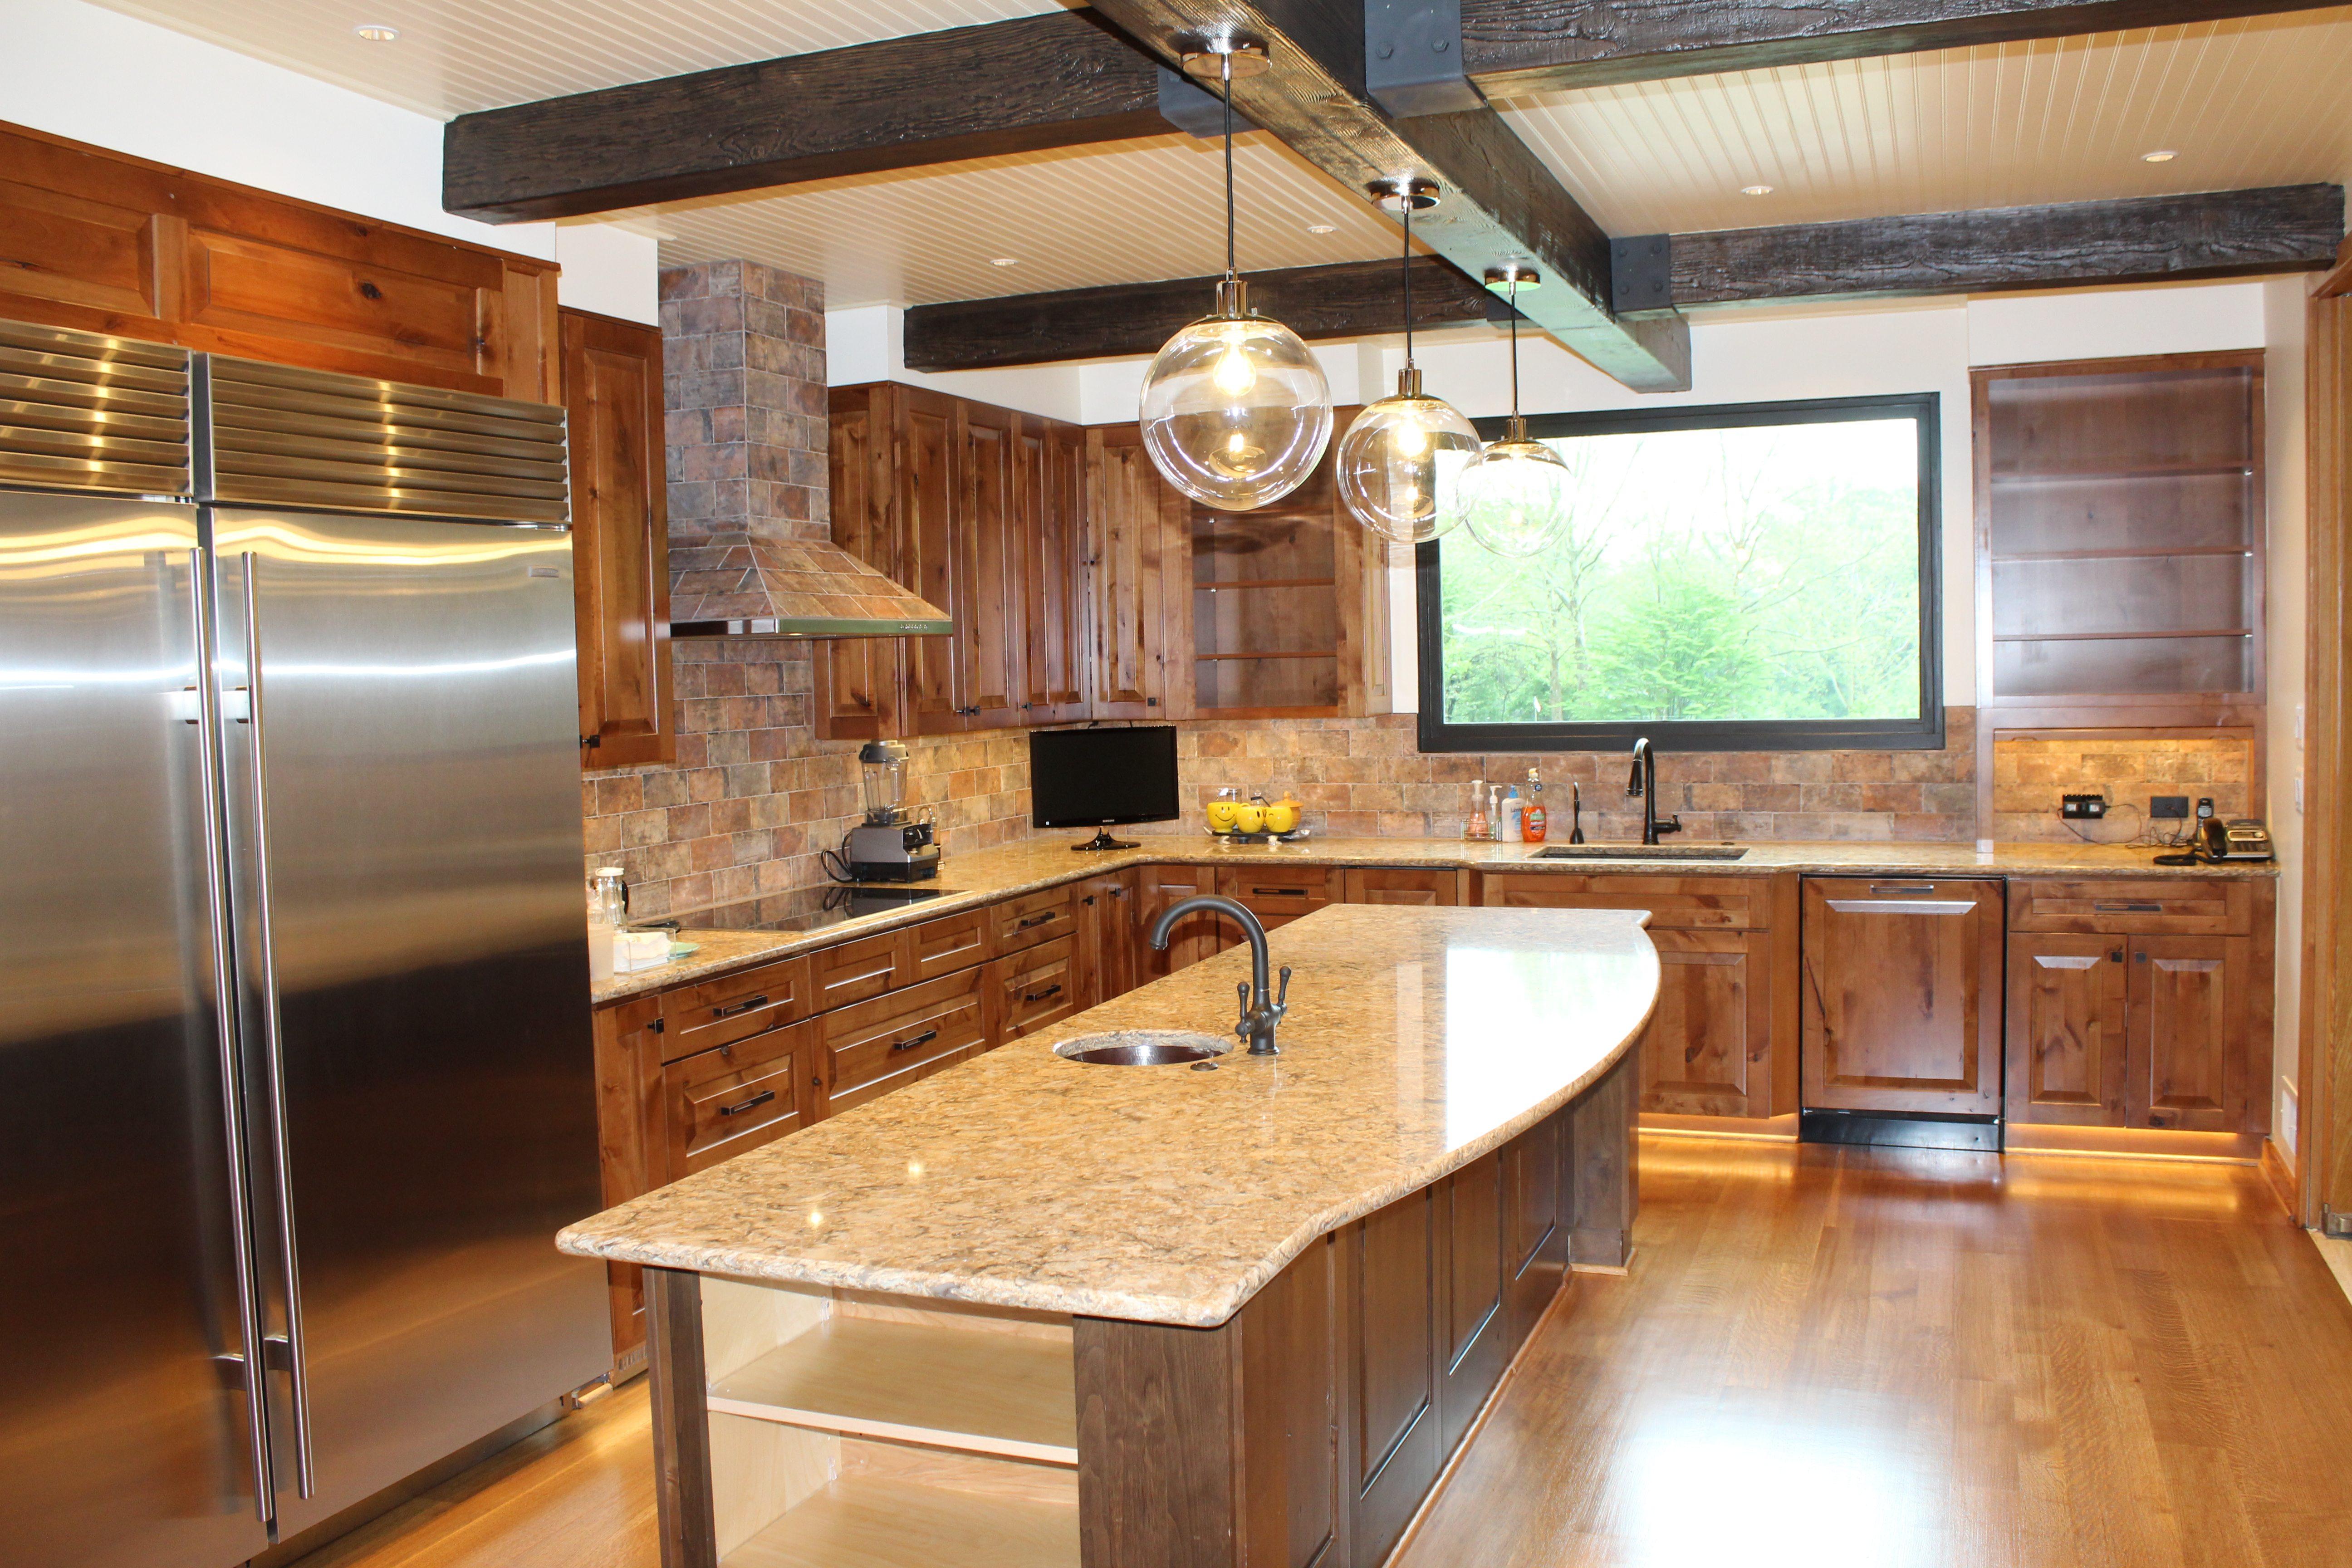 Best Kitchen Remodeling Services Gaithersburg MD | Posts by ...